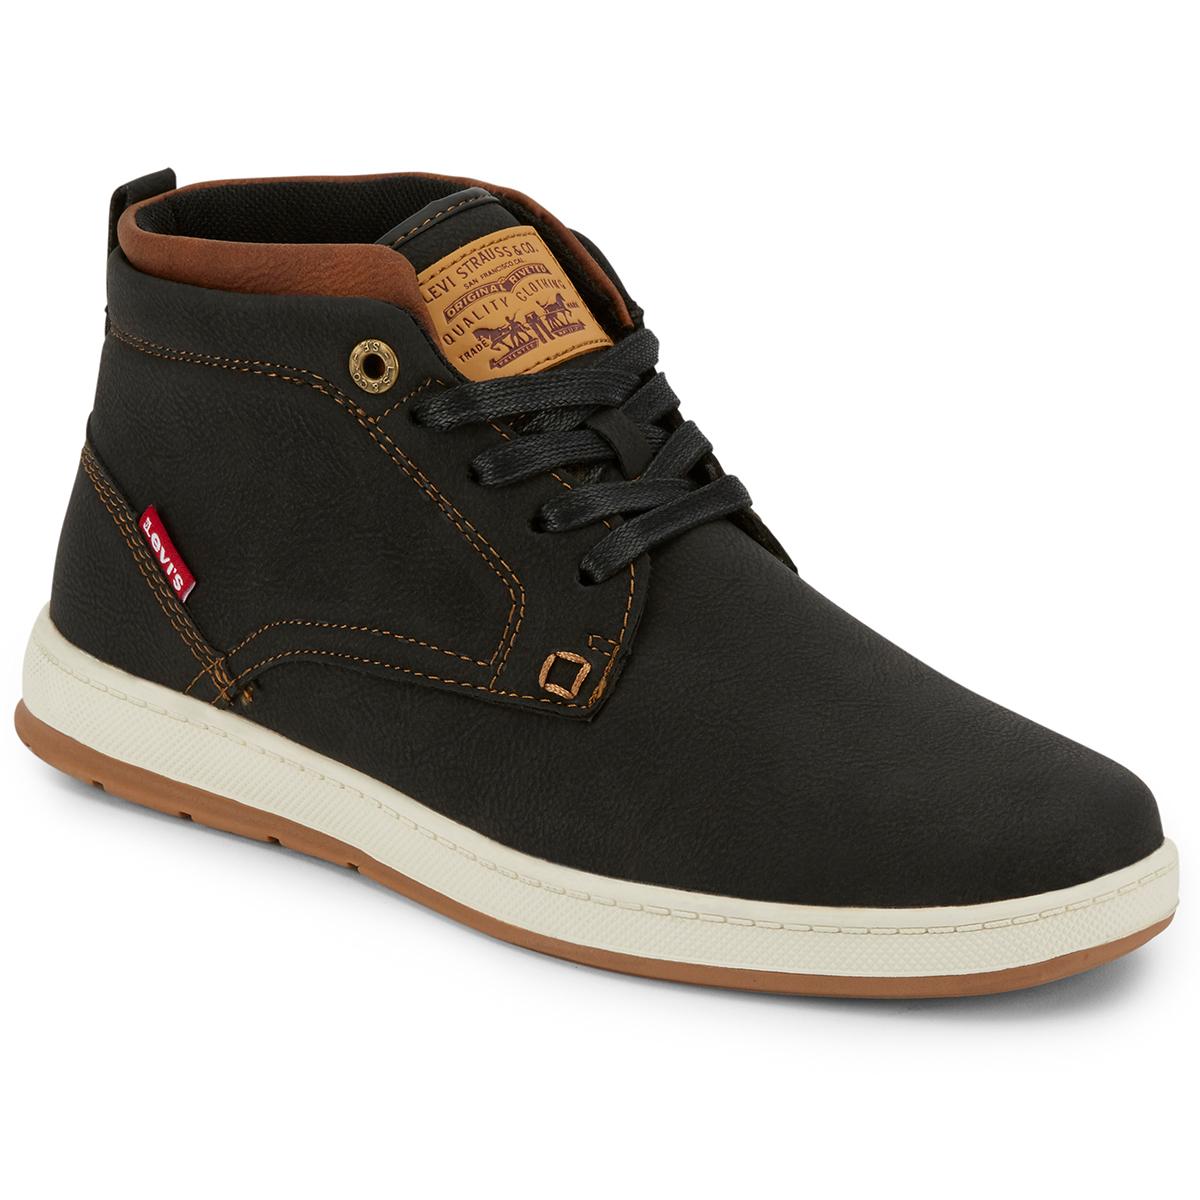 Levi's Men's Goshen Waxed Ul Nb Shoes - Black, 8